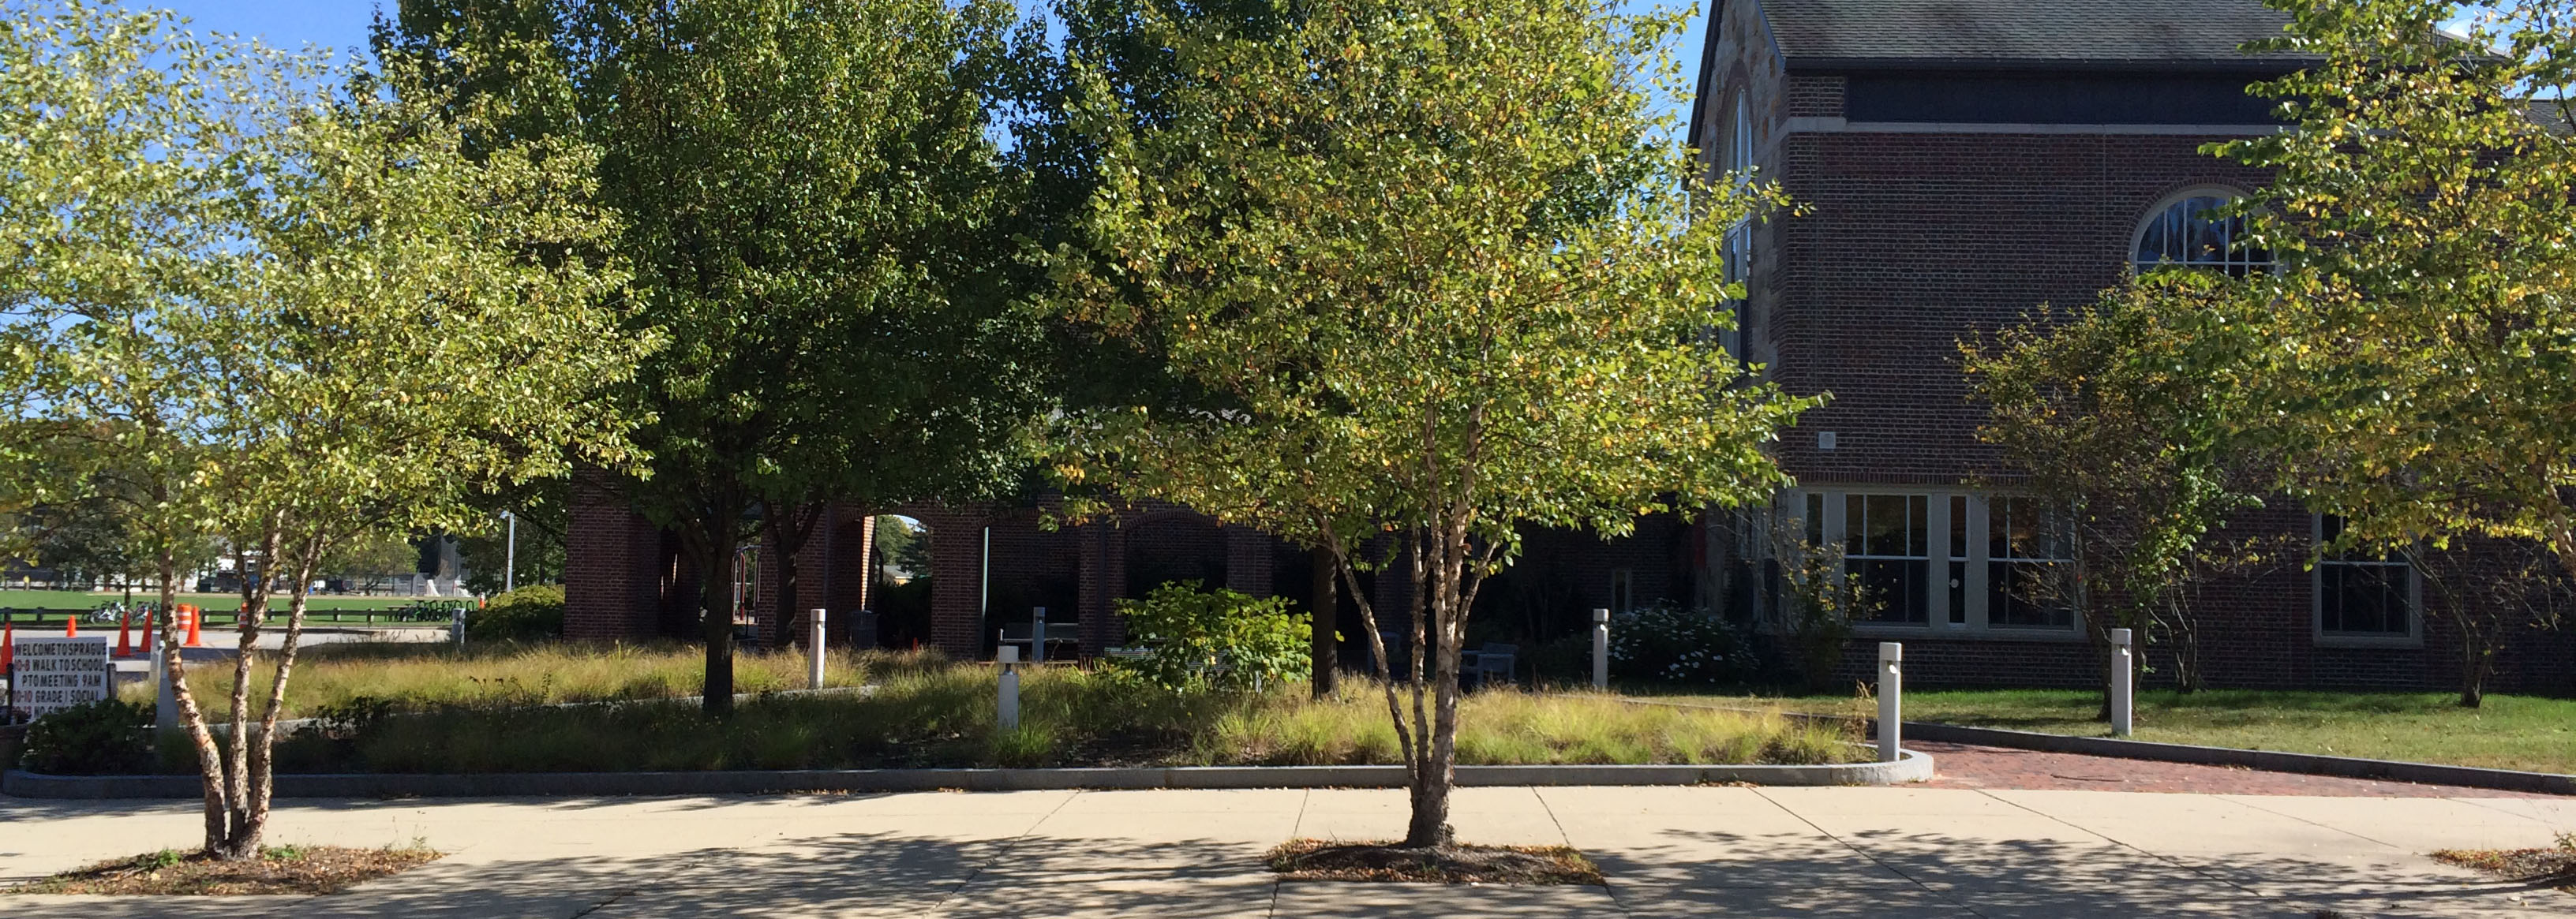 Sprague Elementary School